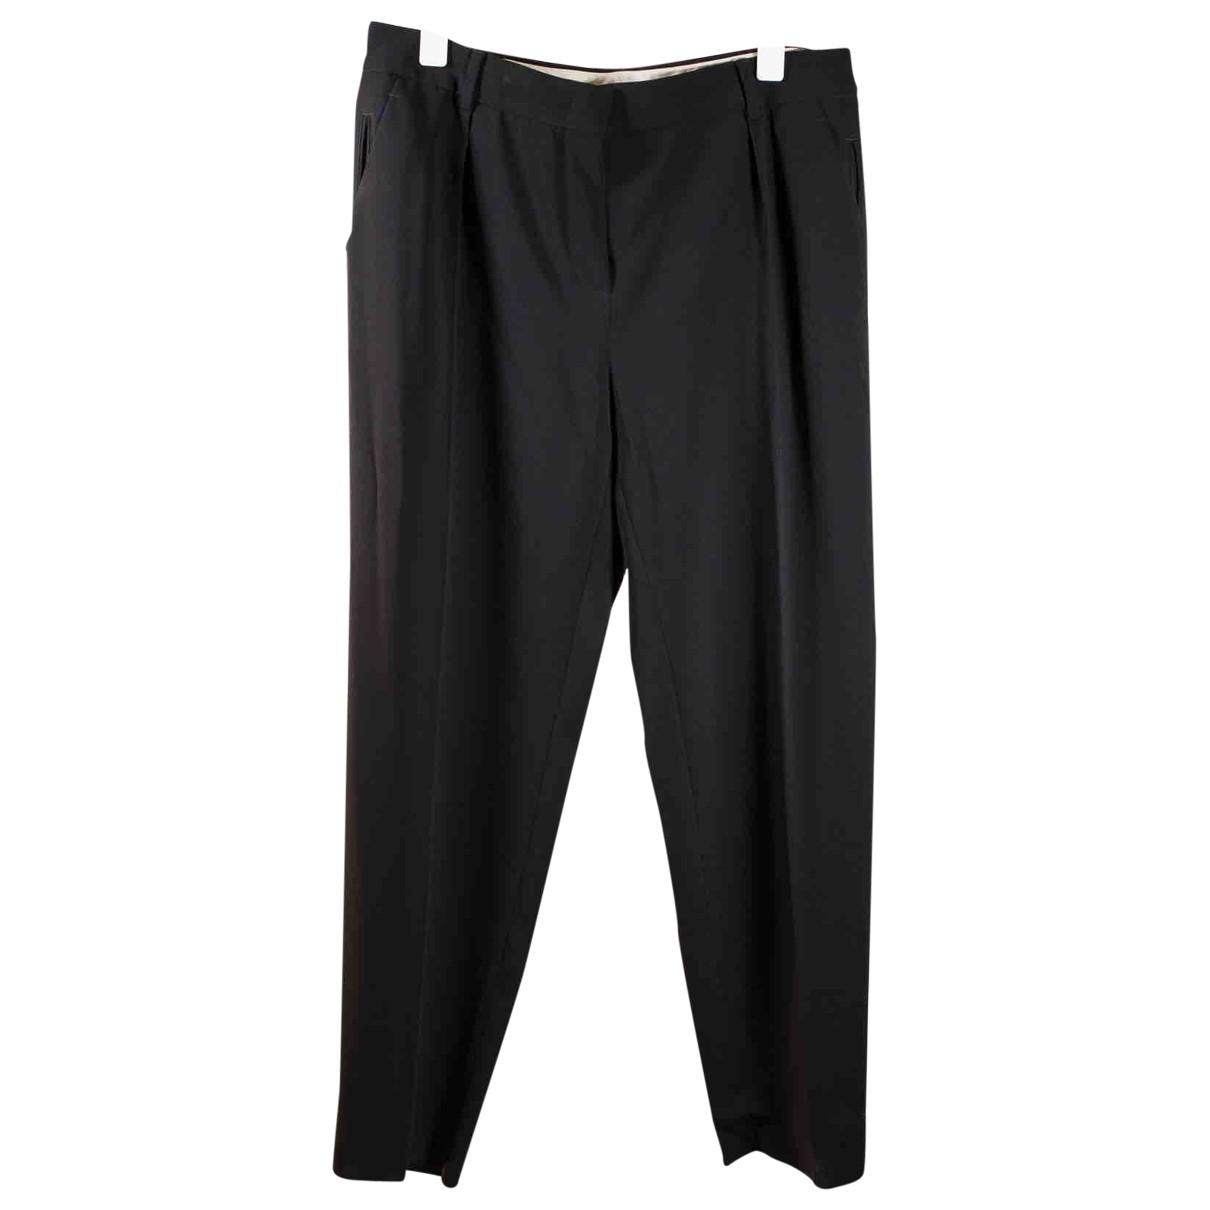 Max Mara Studio \N Black Trousers for Women 44 FR